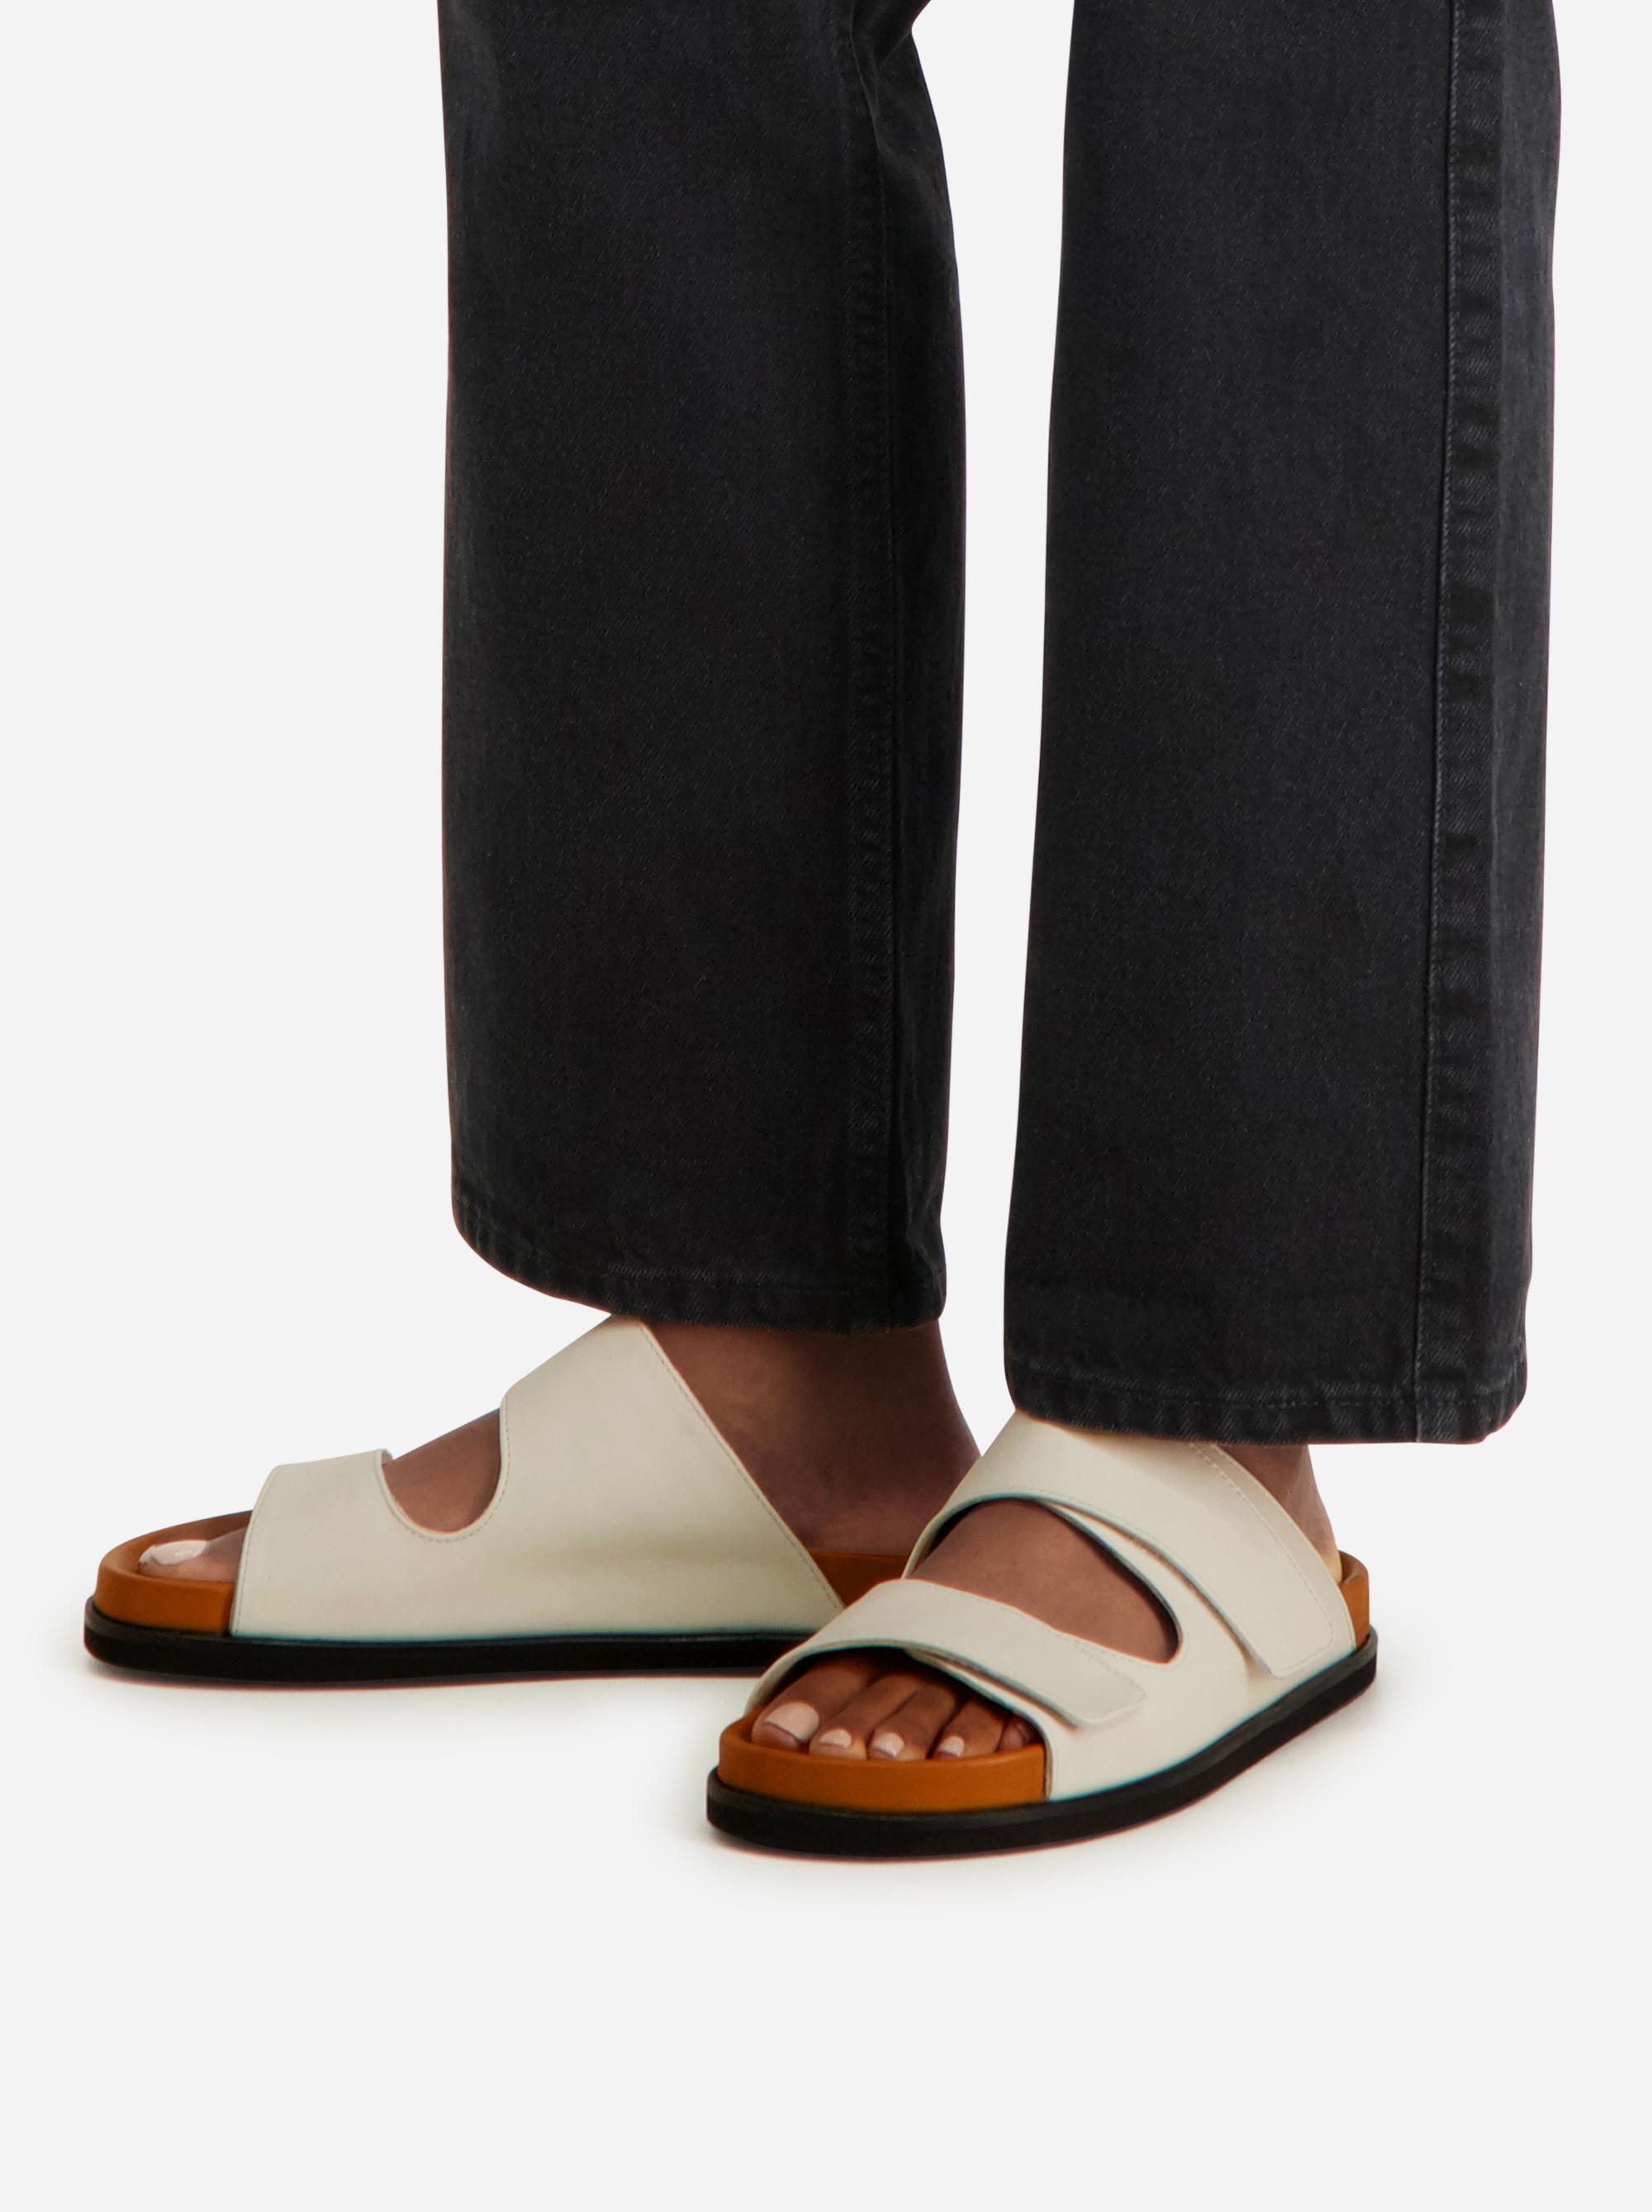 Teym - The Sandal - White - Women - 4